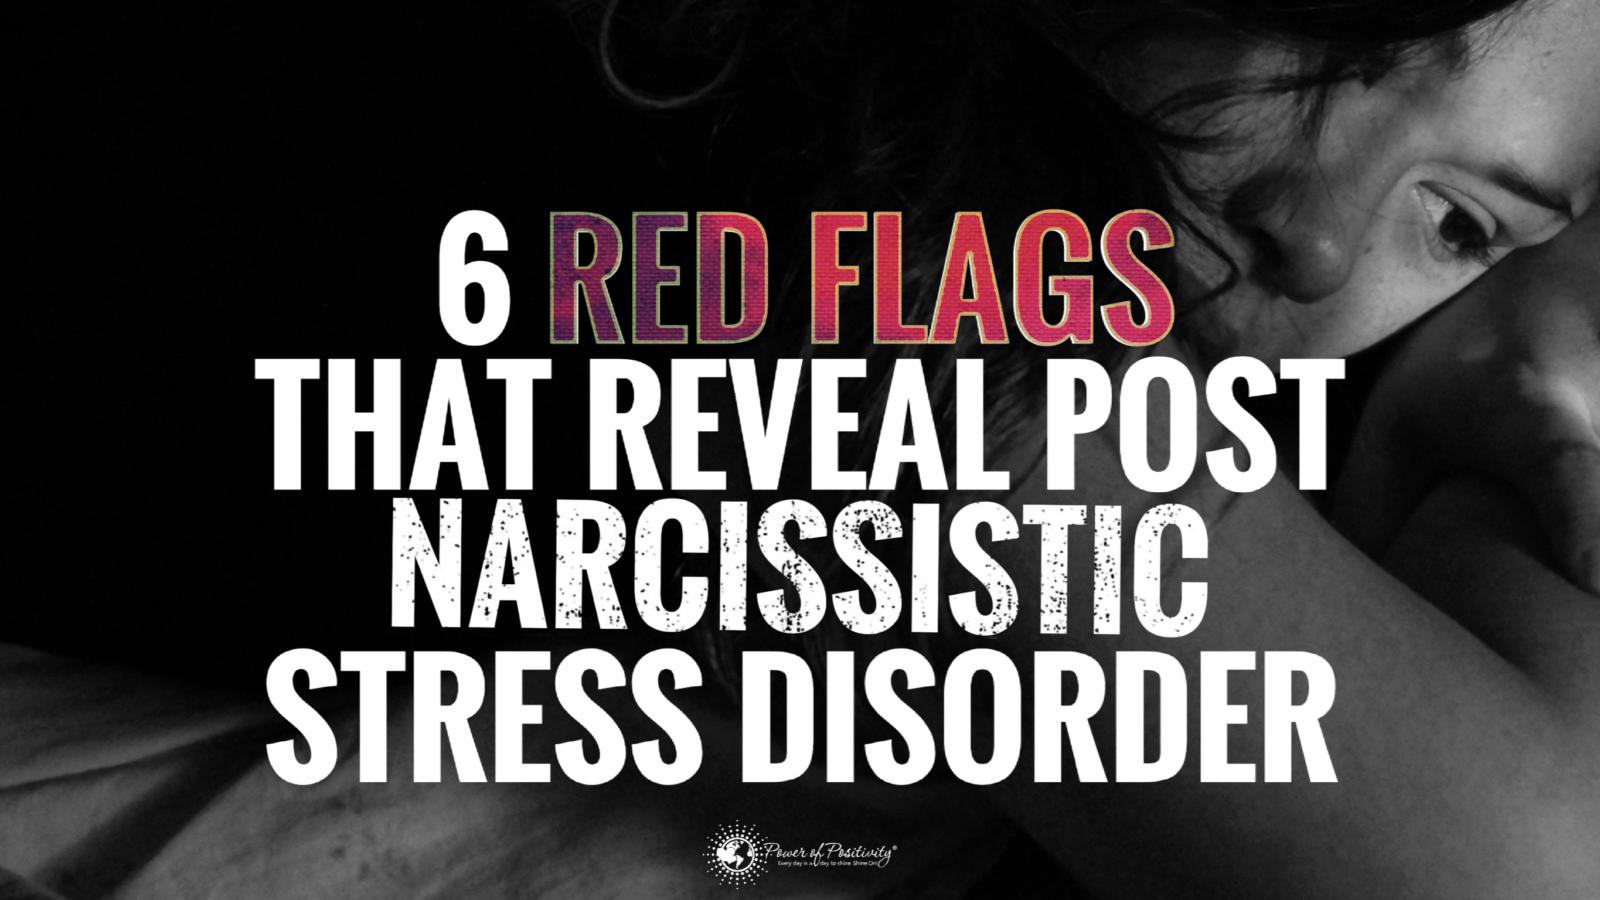 post narcissistic stress disorder